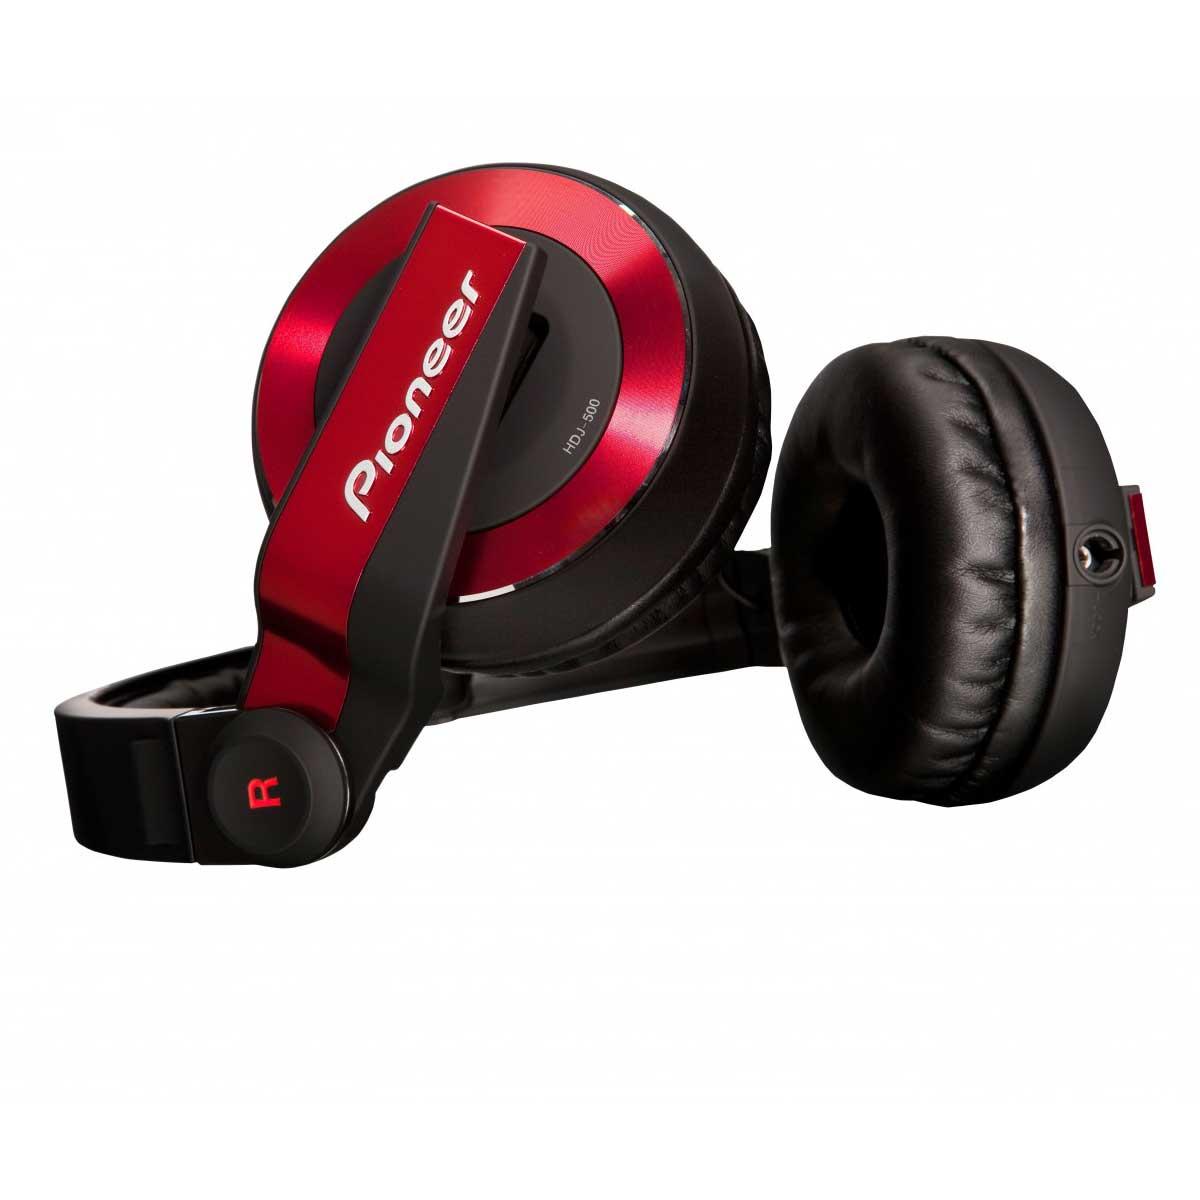 HDJ-500, novo fone Pioneer. Design, conforto e qualidade! fones de ouvidos, hdj1000, hdj2000, hdj500, pioneer, rpdj1200a, technics